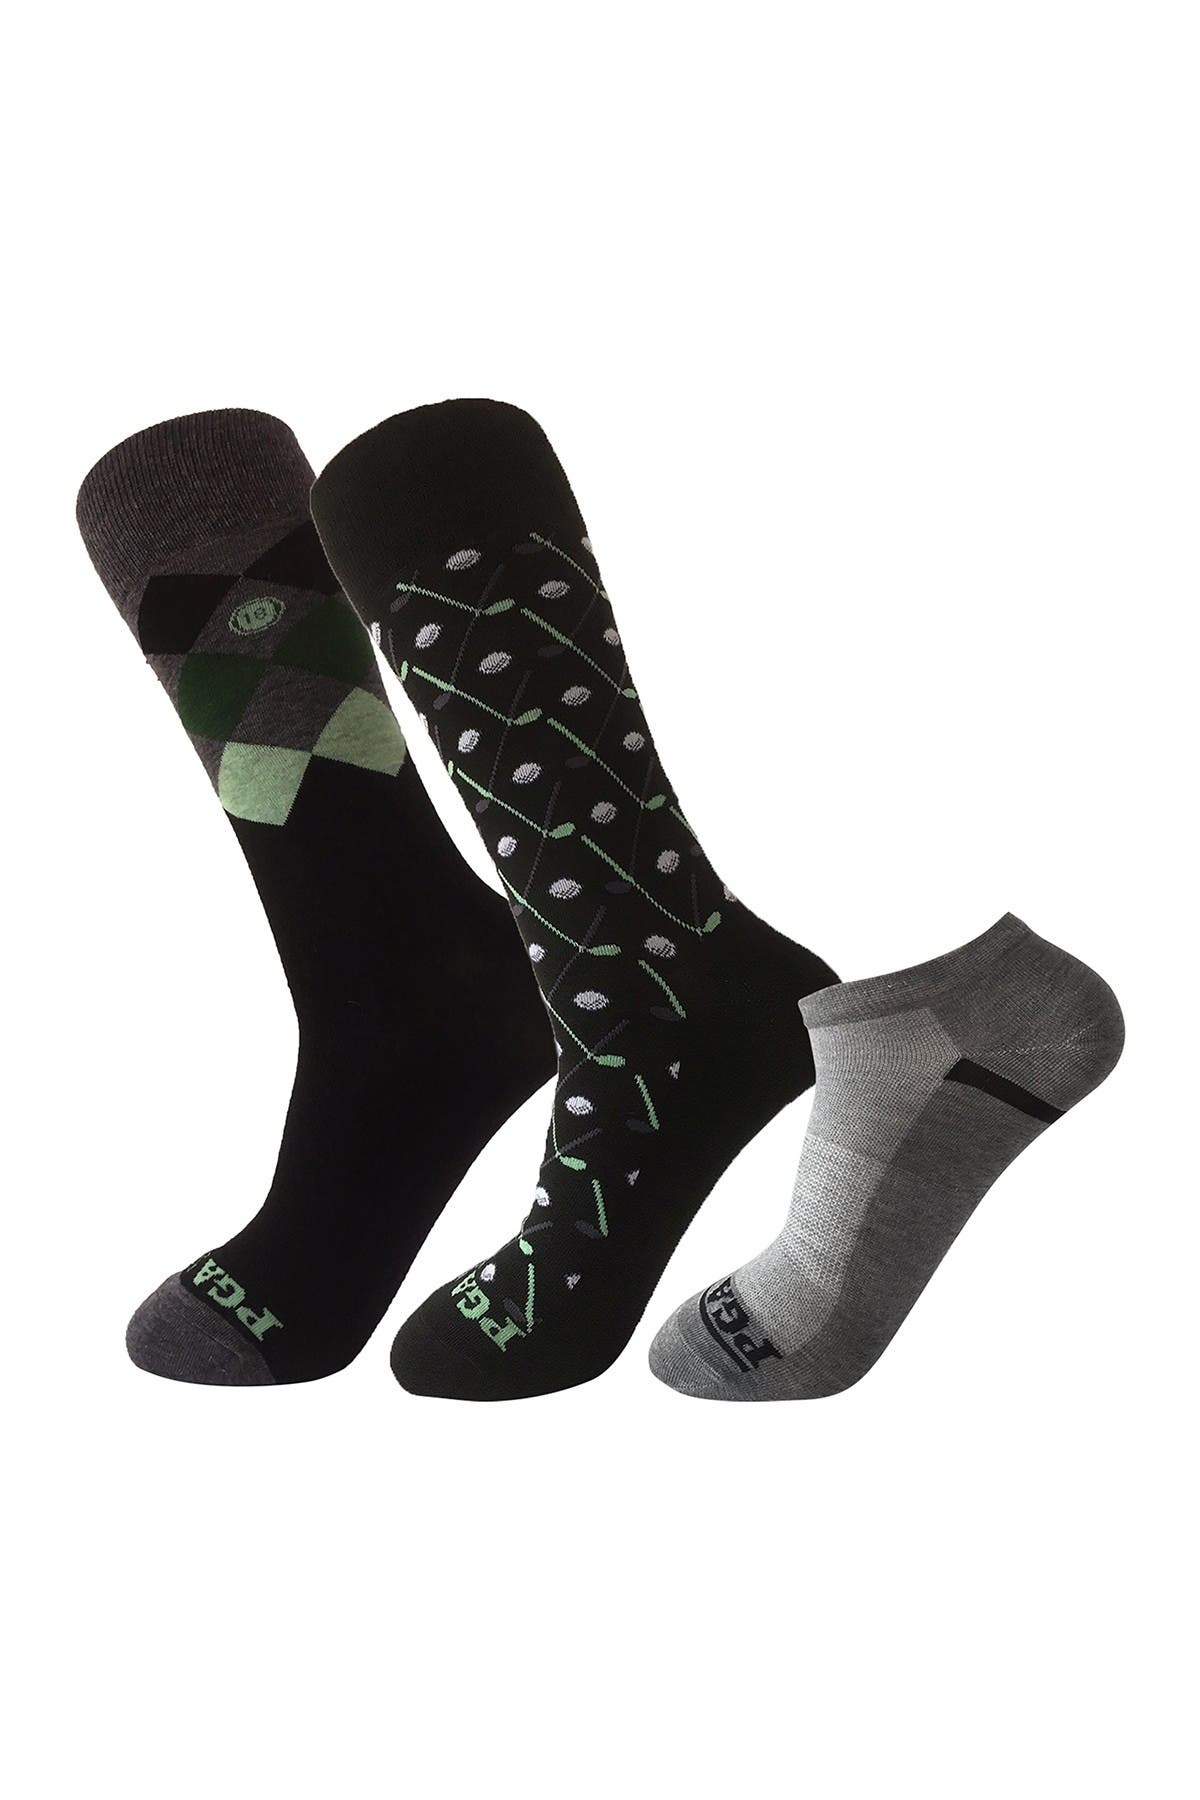 Image of PGA TOUR Gift Box Set - 3 Pack of Socks